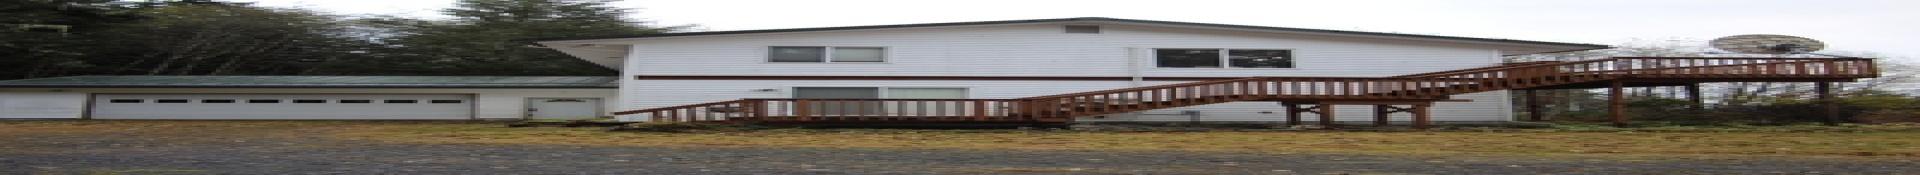 zimovia hwy, Wrangell, Alaska 99929, 4 Bedrooms Bedrooms, ,2 BathroomsBathrooms,Single Family Home,Sold Listings,zimovia hwy,1159